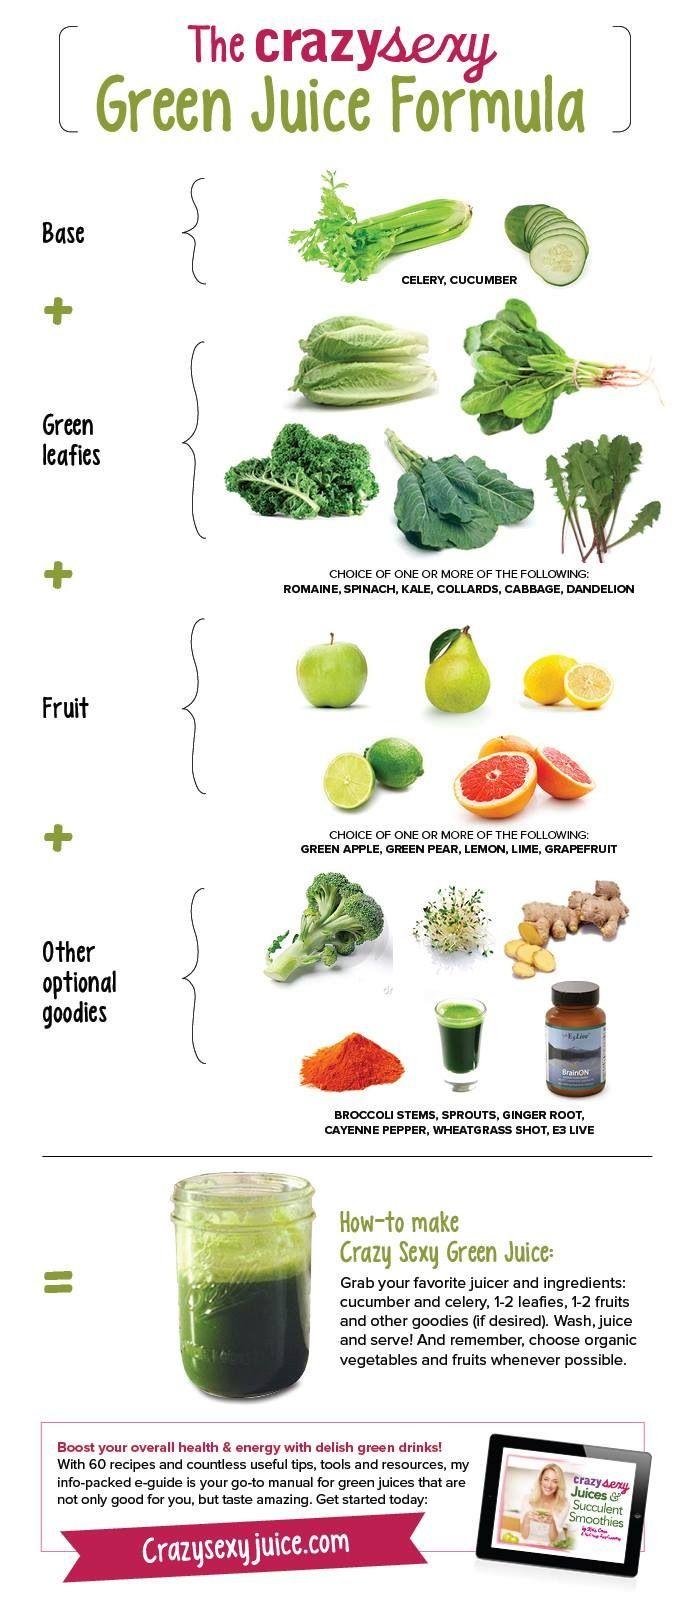 Kris Carr's Green Juice guide   alkaline acid detox   Pinterest